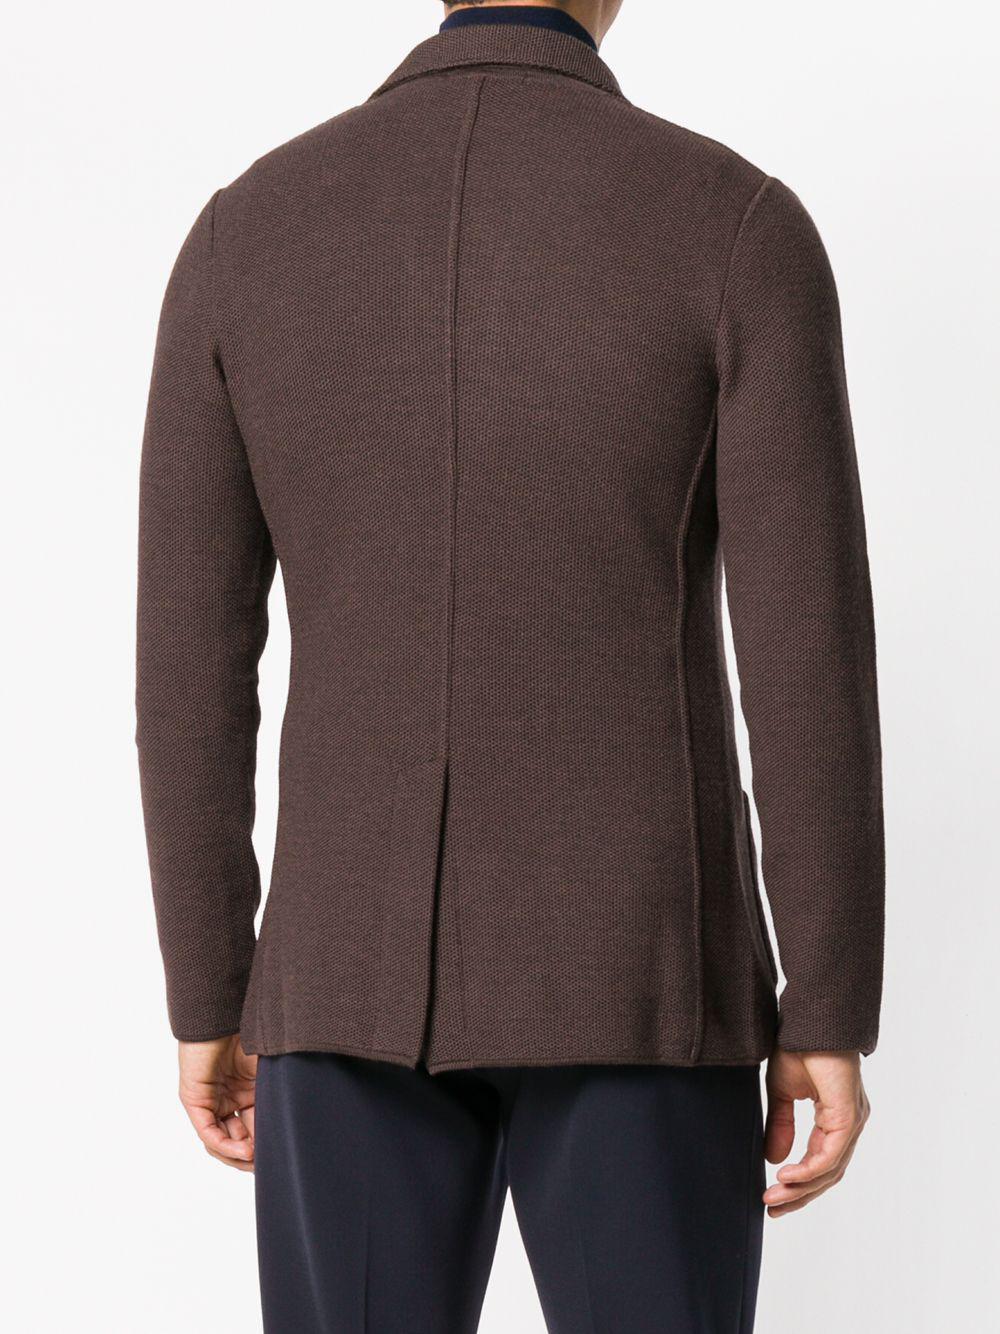 Lardini Wool Blazer Cardigan in Brown for Men